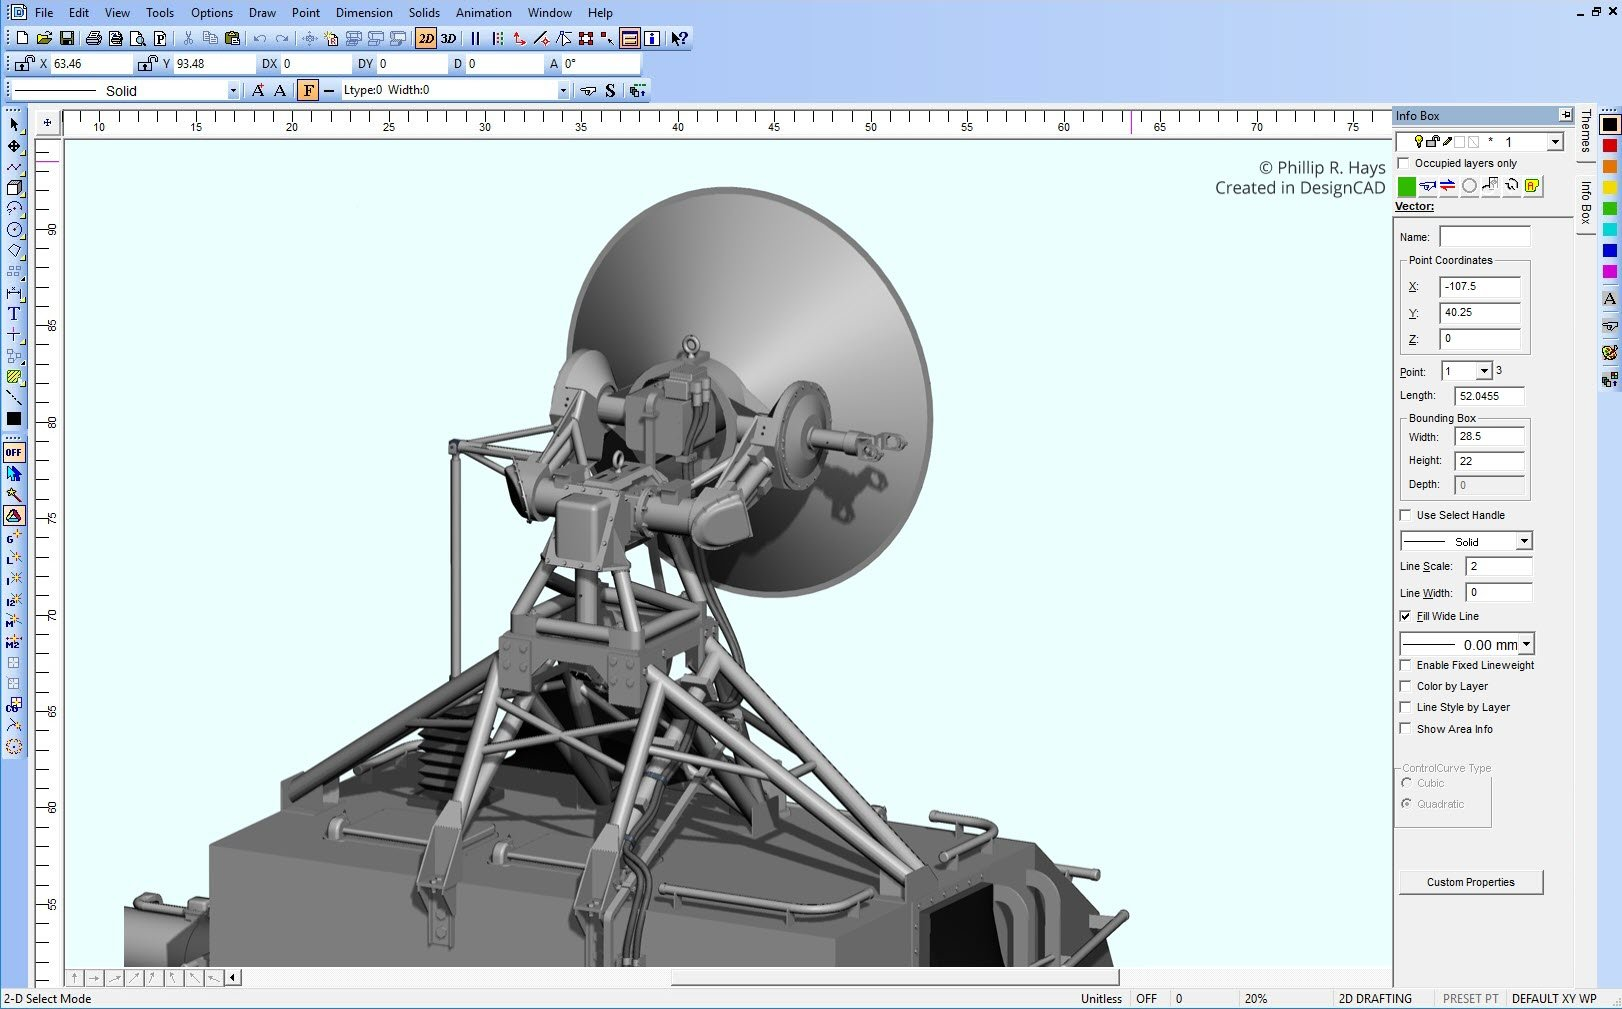 DesignCAD Demo - 3D Rendering